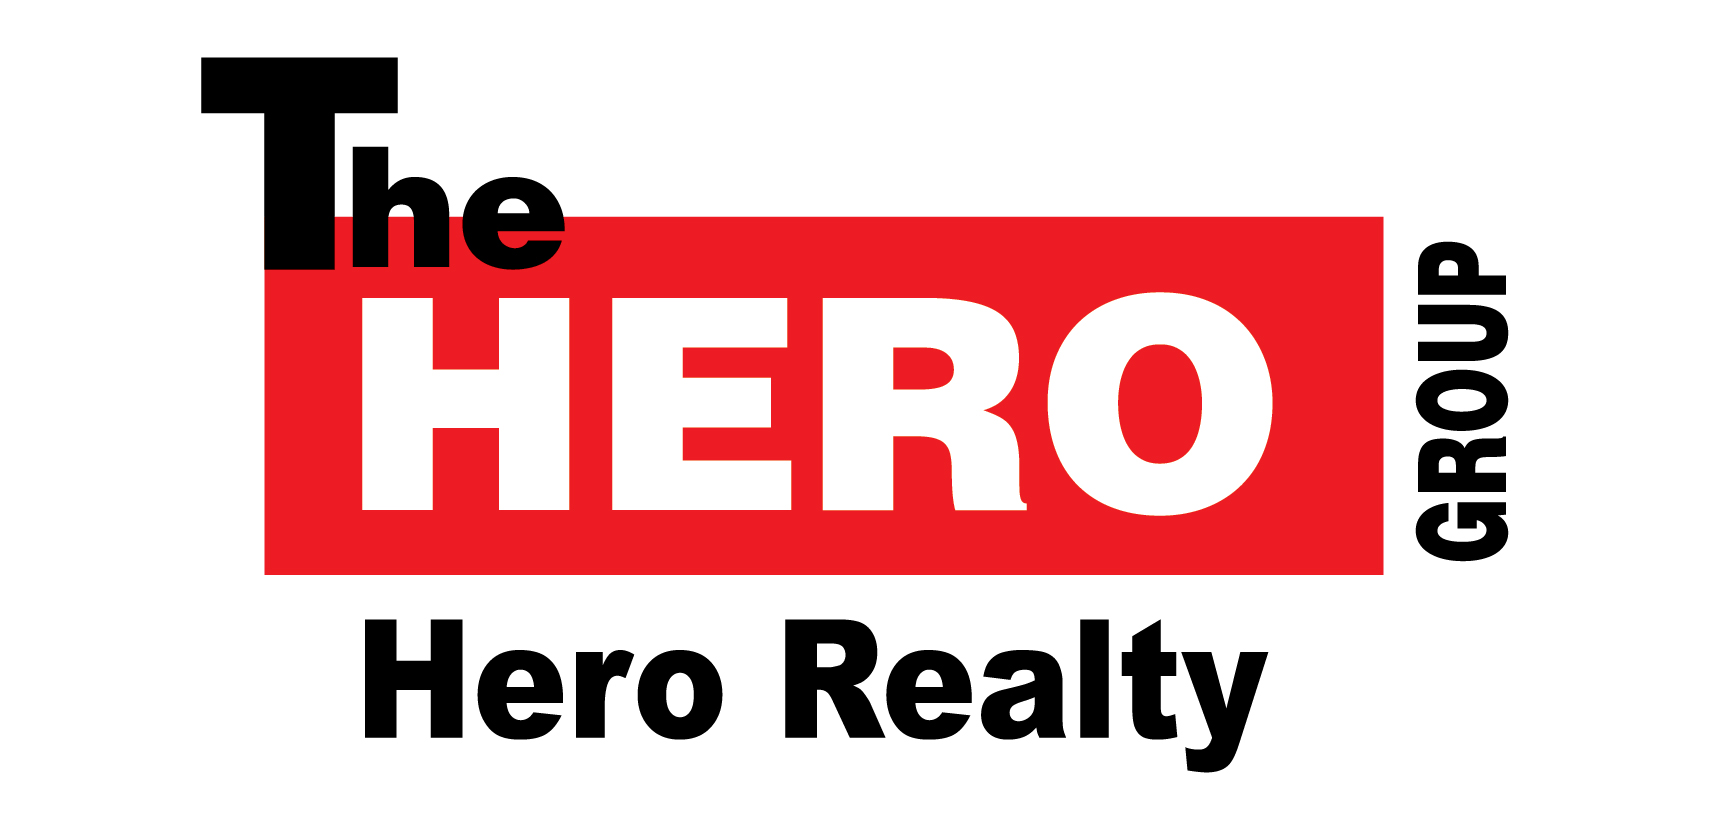 Hero Realty